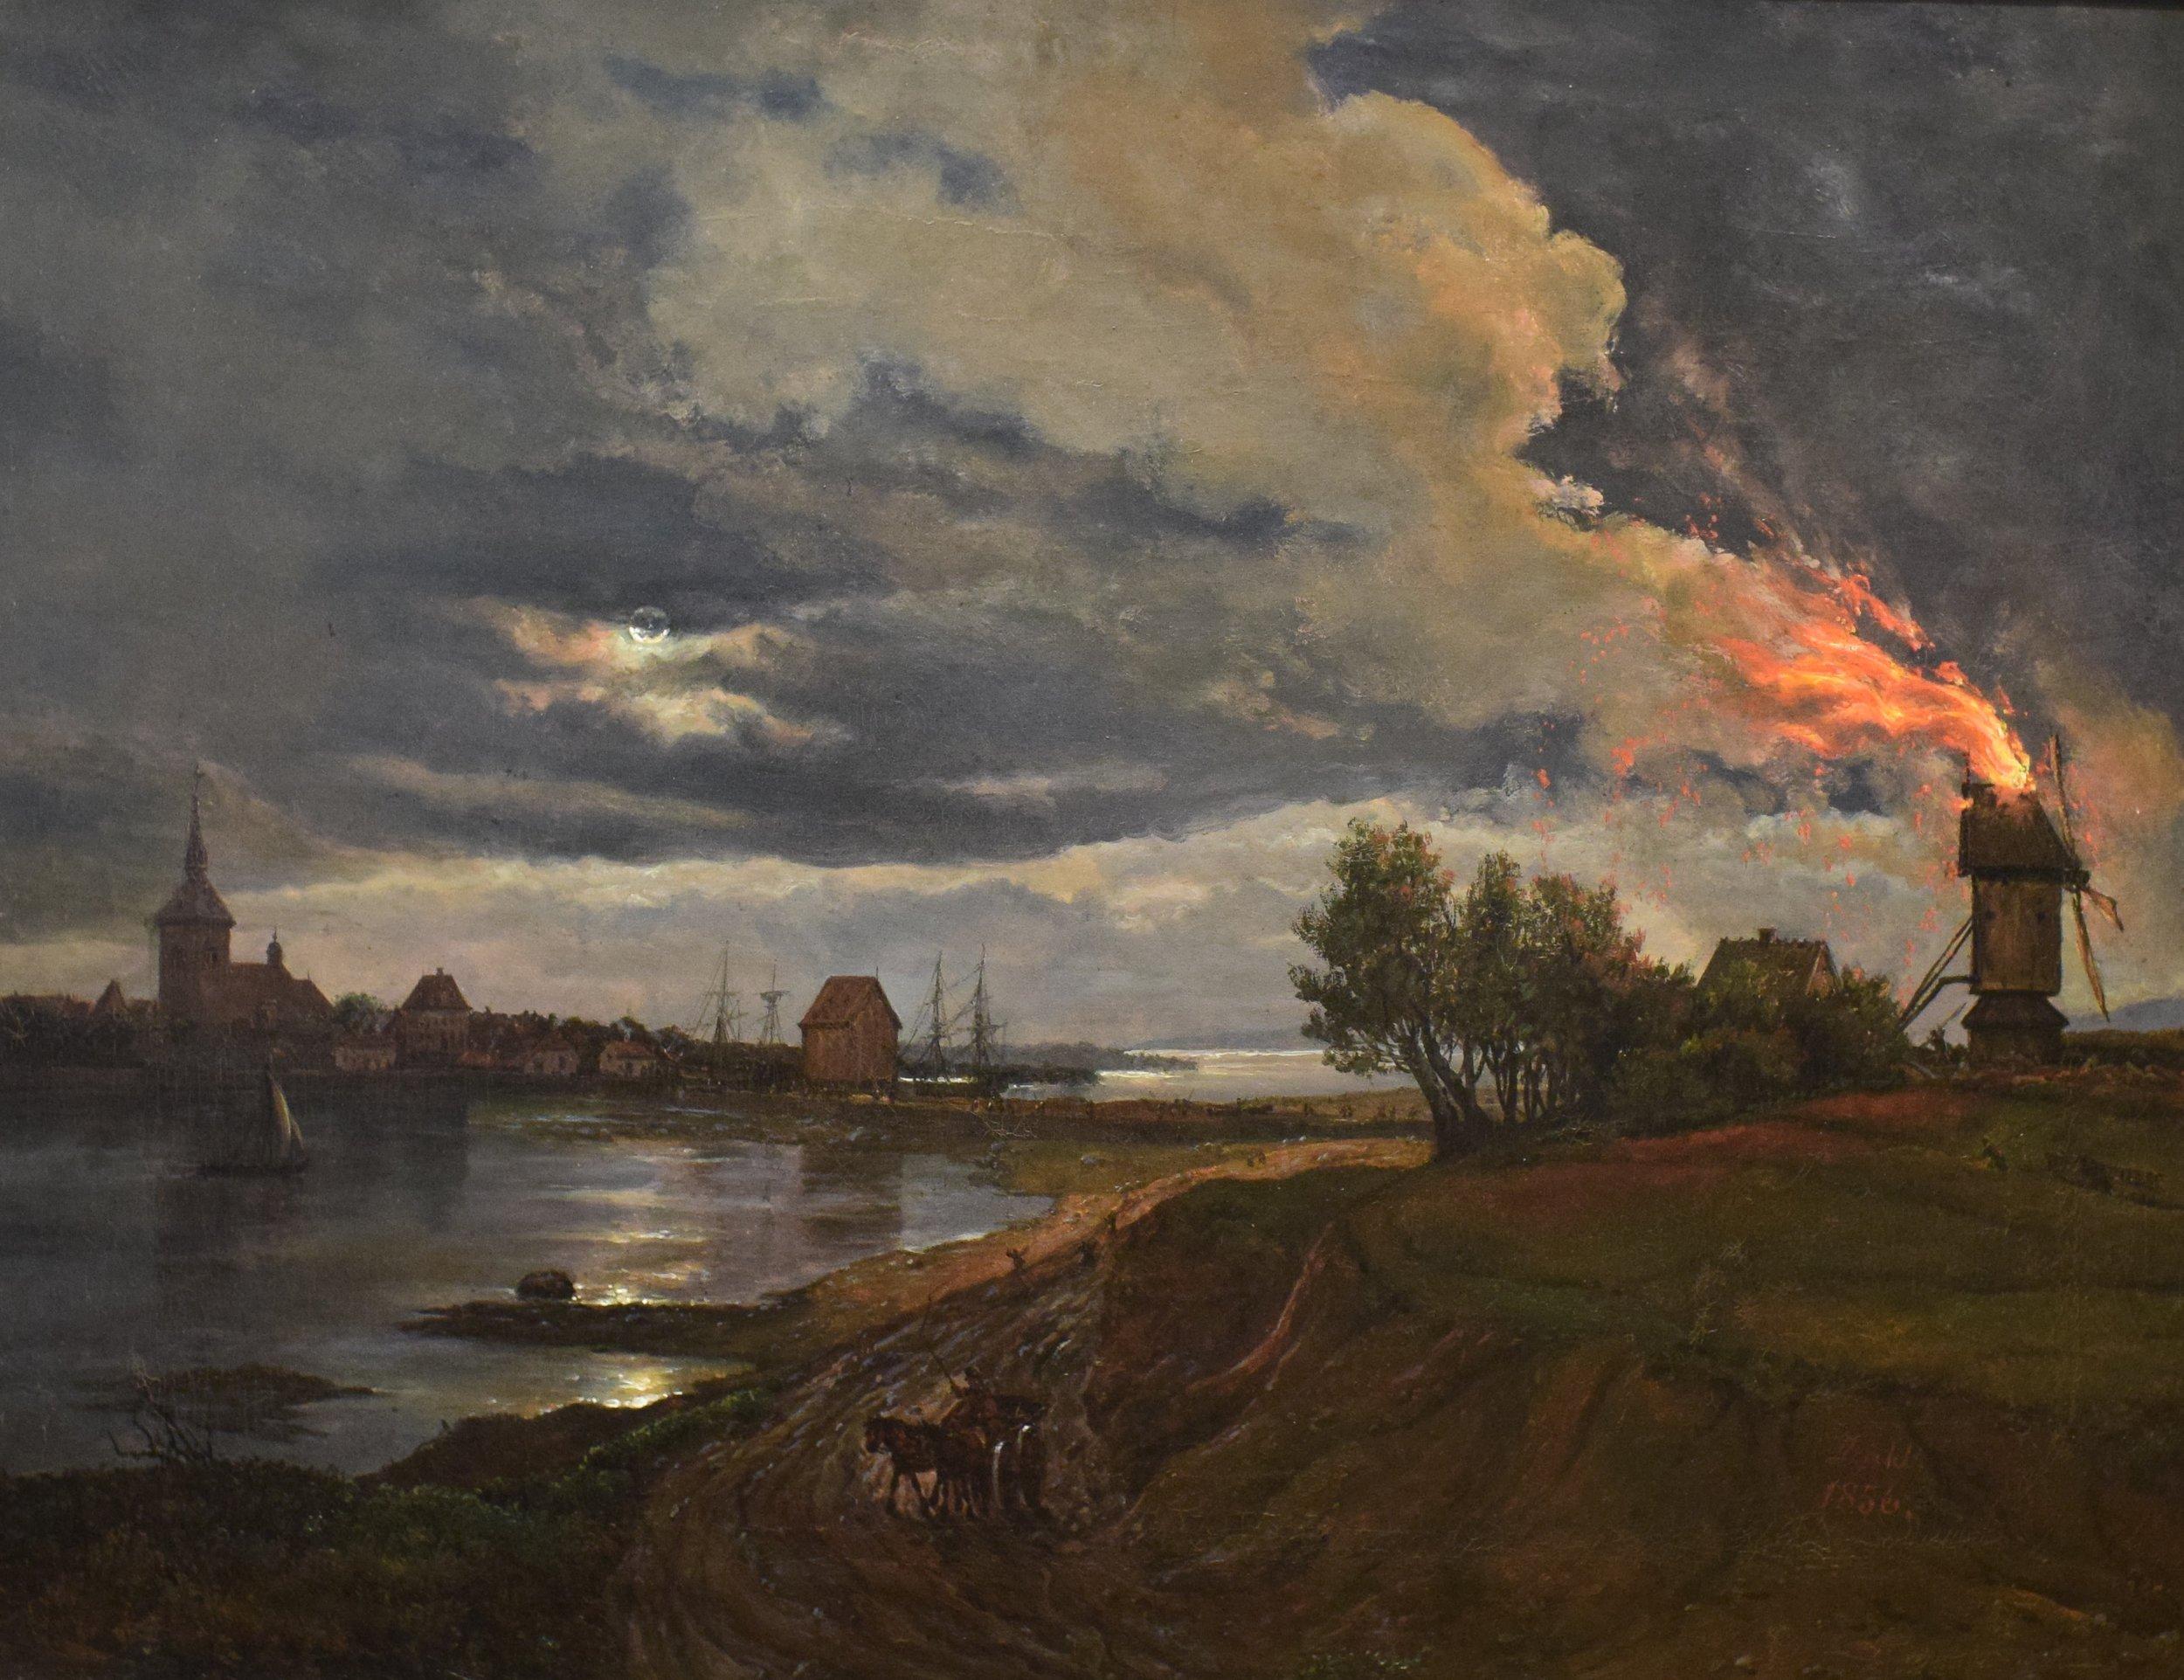 Johan Christian Dahl, Burning Windmill at Stege, 1856, Nasjonalmuseet